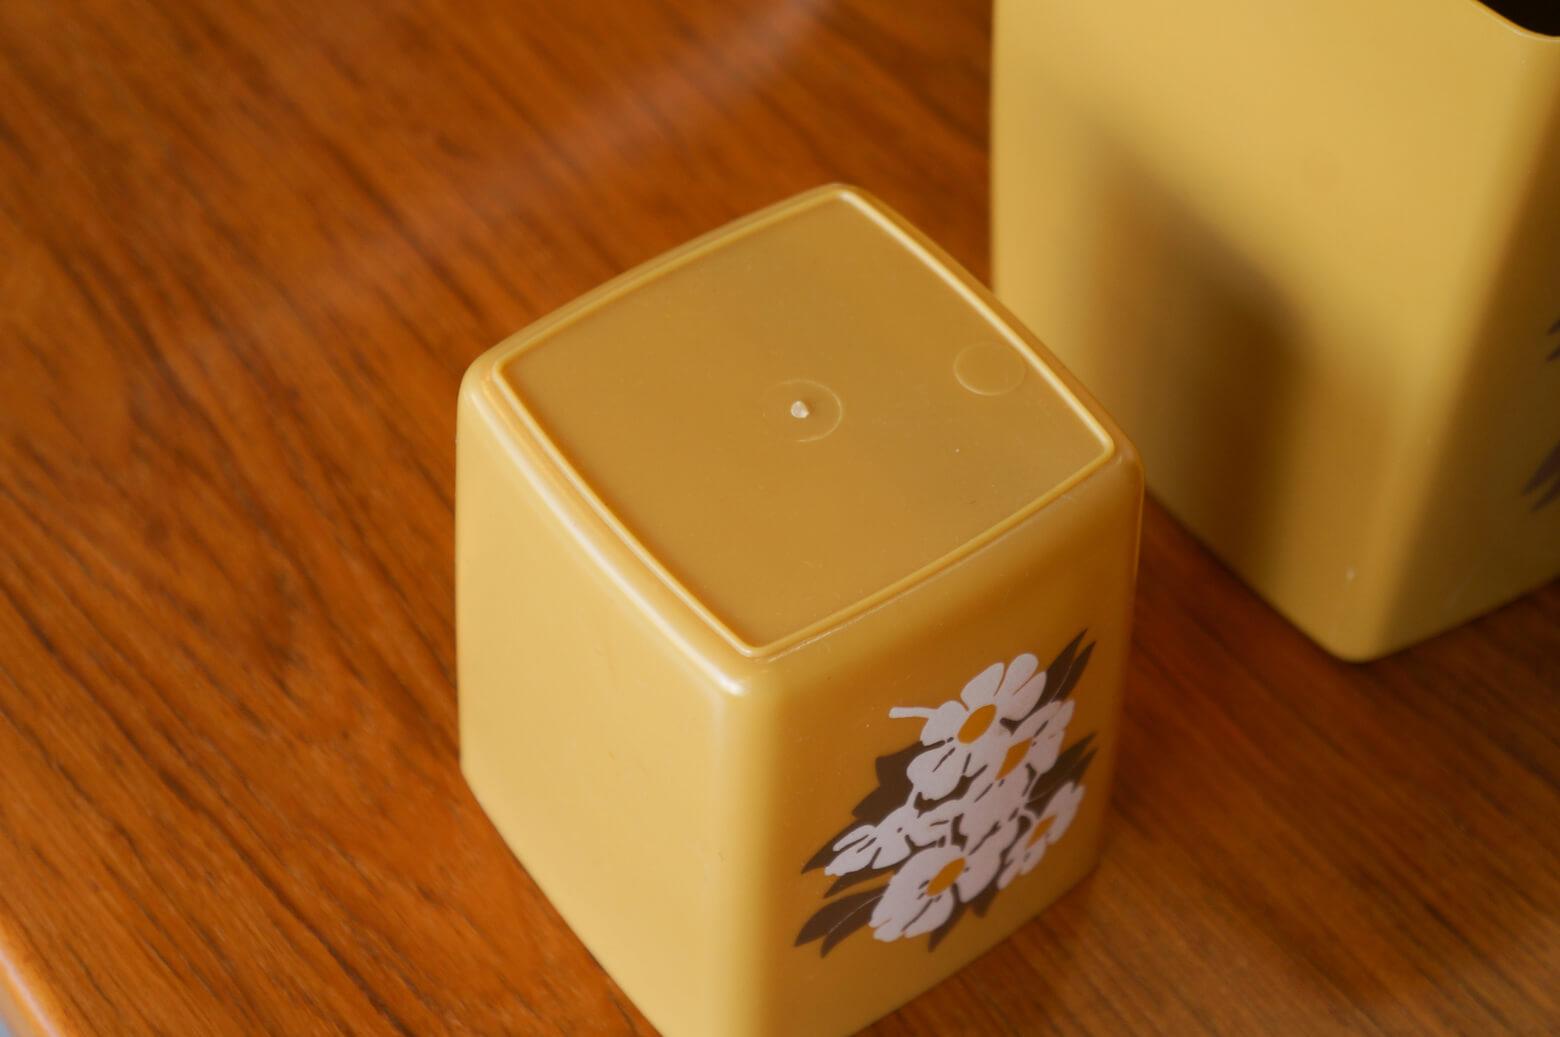 US Vintage Plastic Canister Set/アメリカ ヴィンテージ プラスチック キャニスター セット 入れ子 レトロ キッチン雑貨